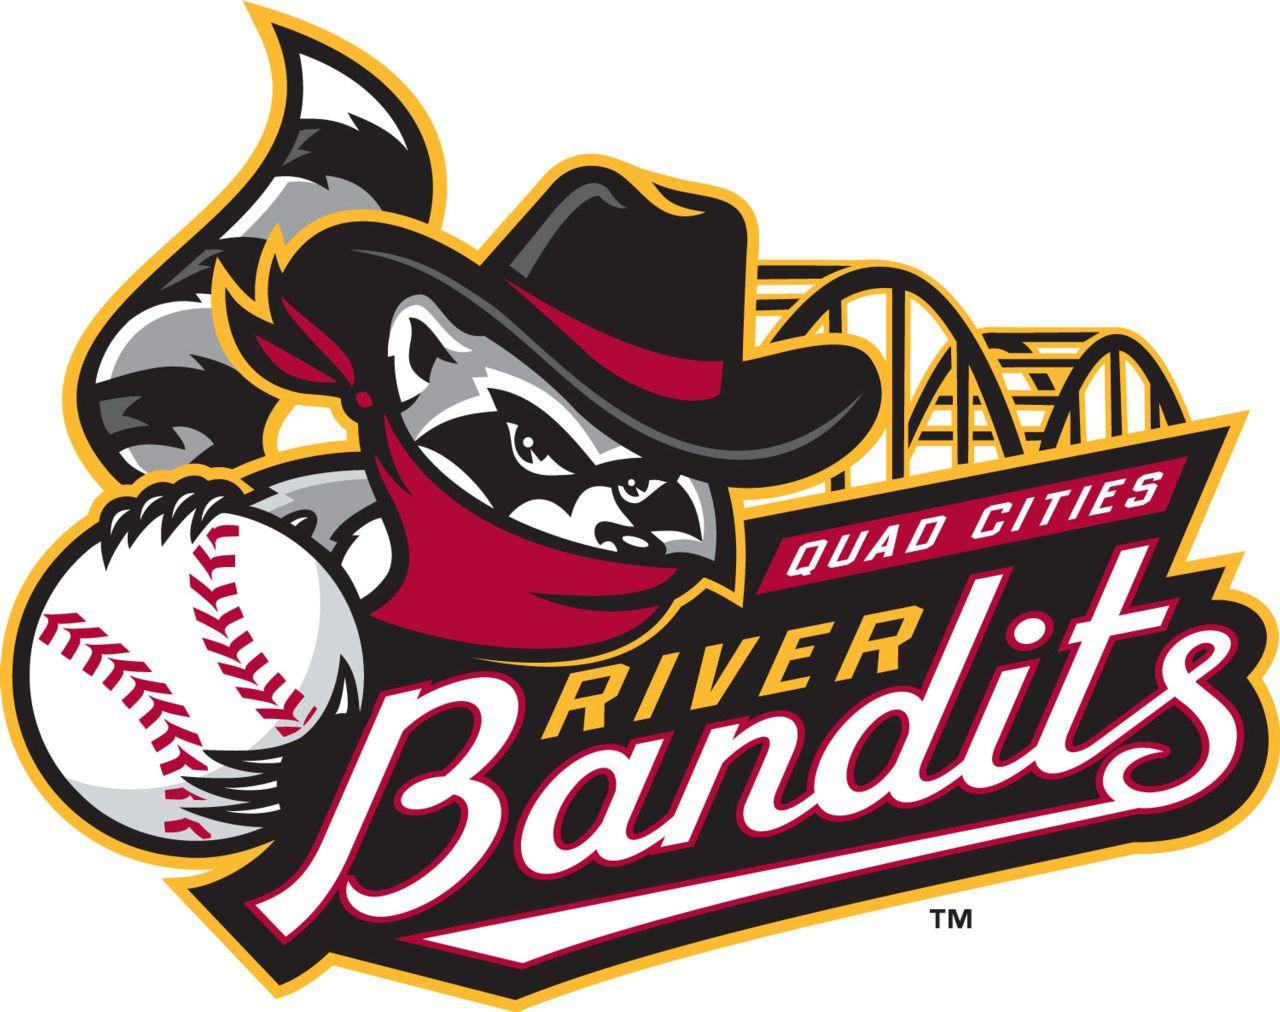 river bandits logo